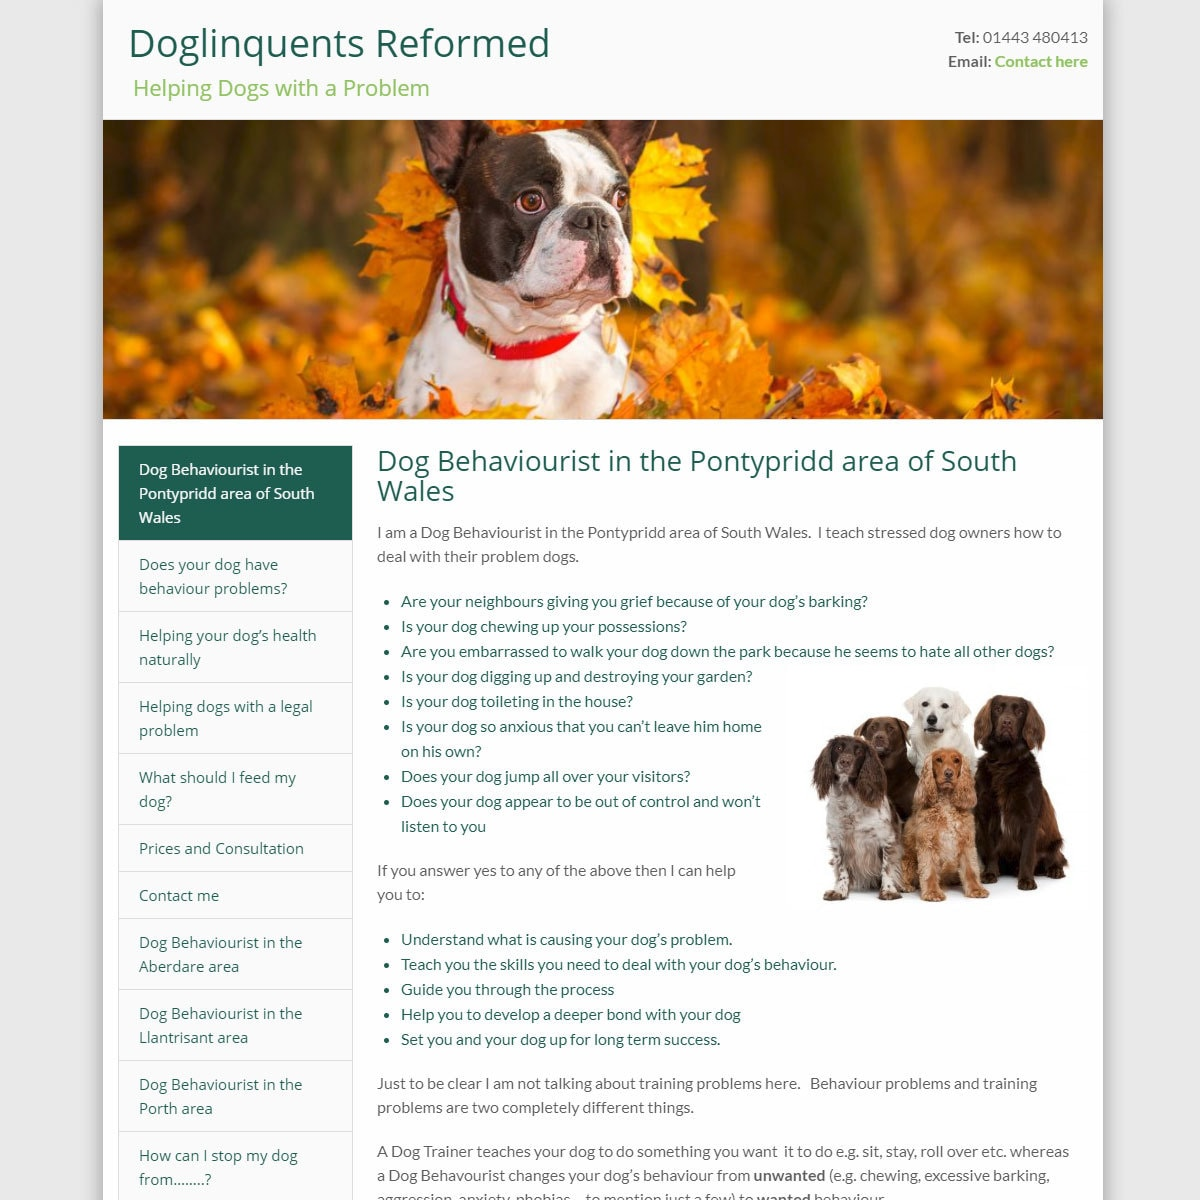 doglinquents